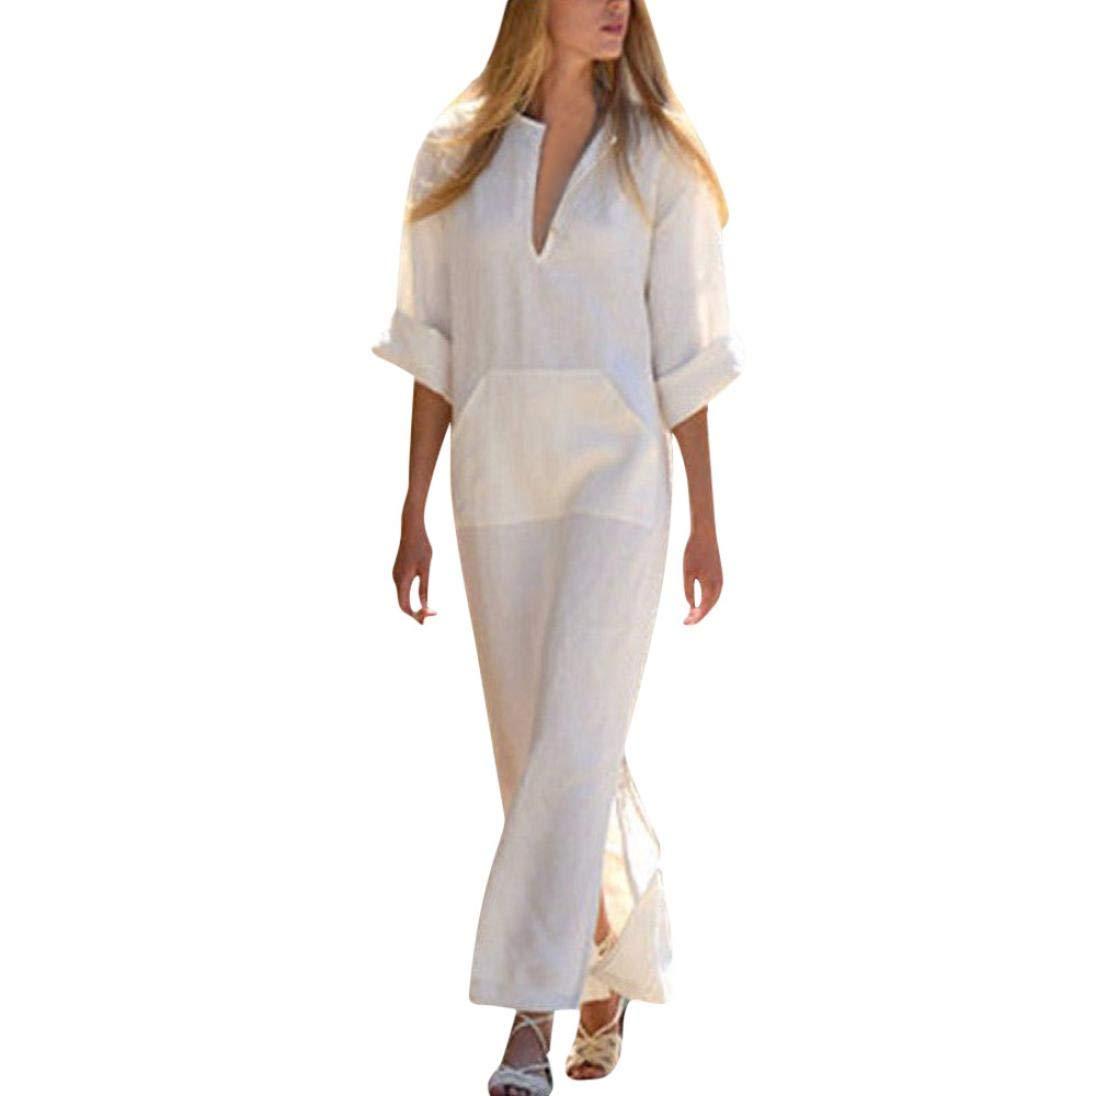 REYO ♥ [M-3XL] Clearance Sale Women's Dresses V-neckline Loose Pocket Dress Long Sleeve Mini Dress